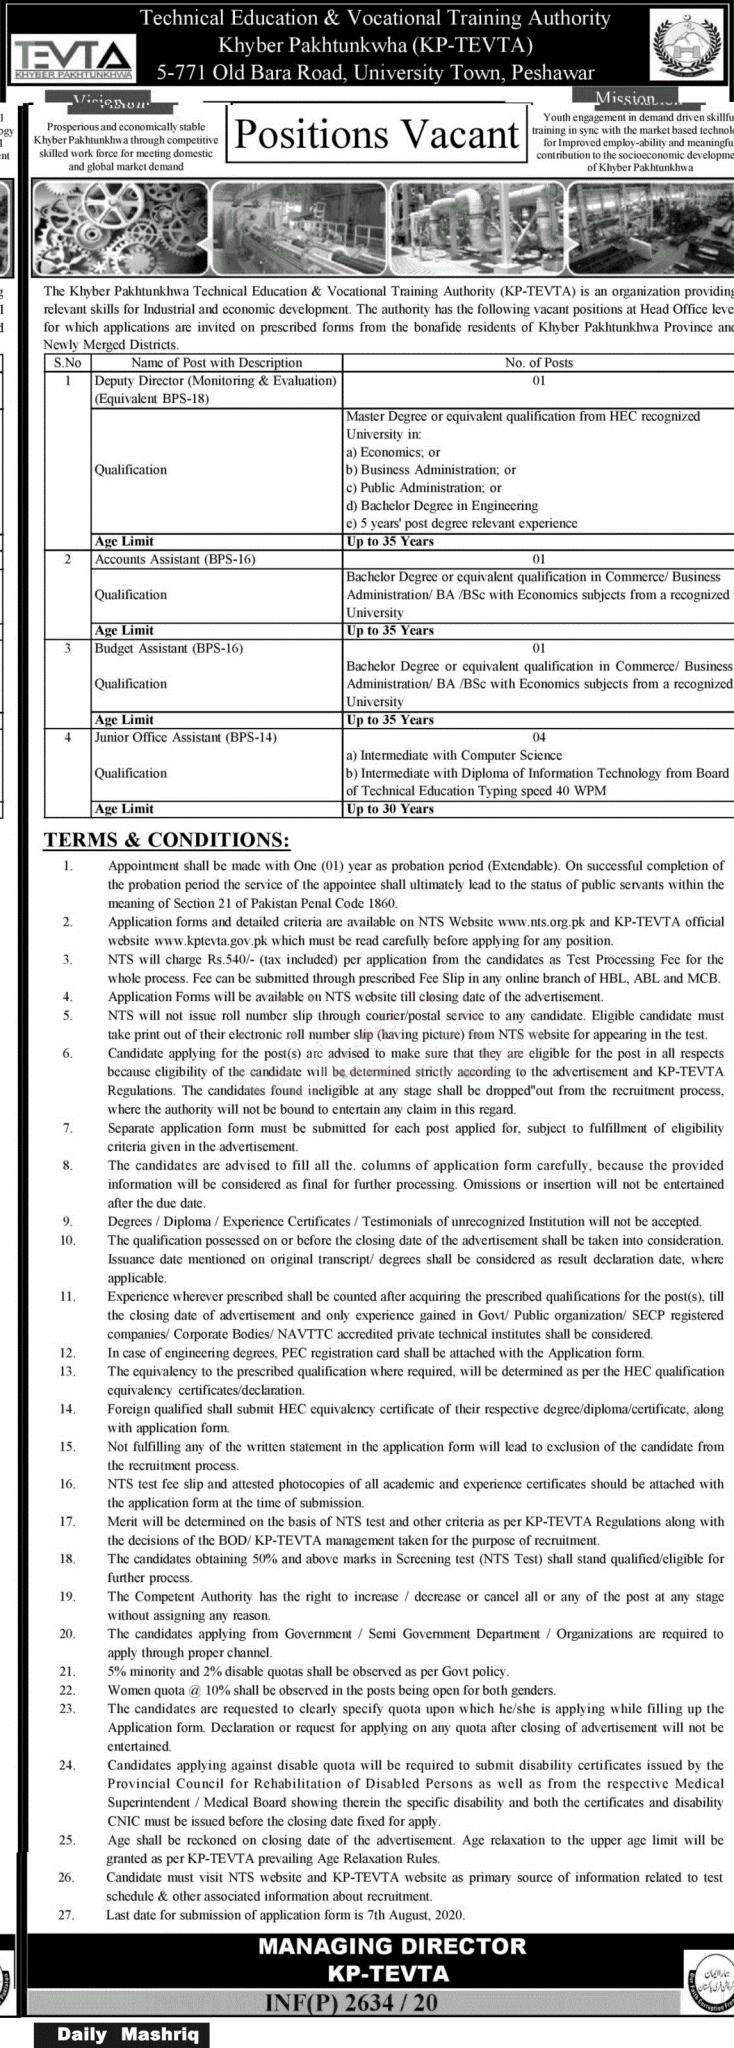 TEVTA Jobs July 2020